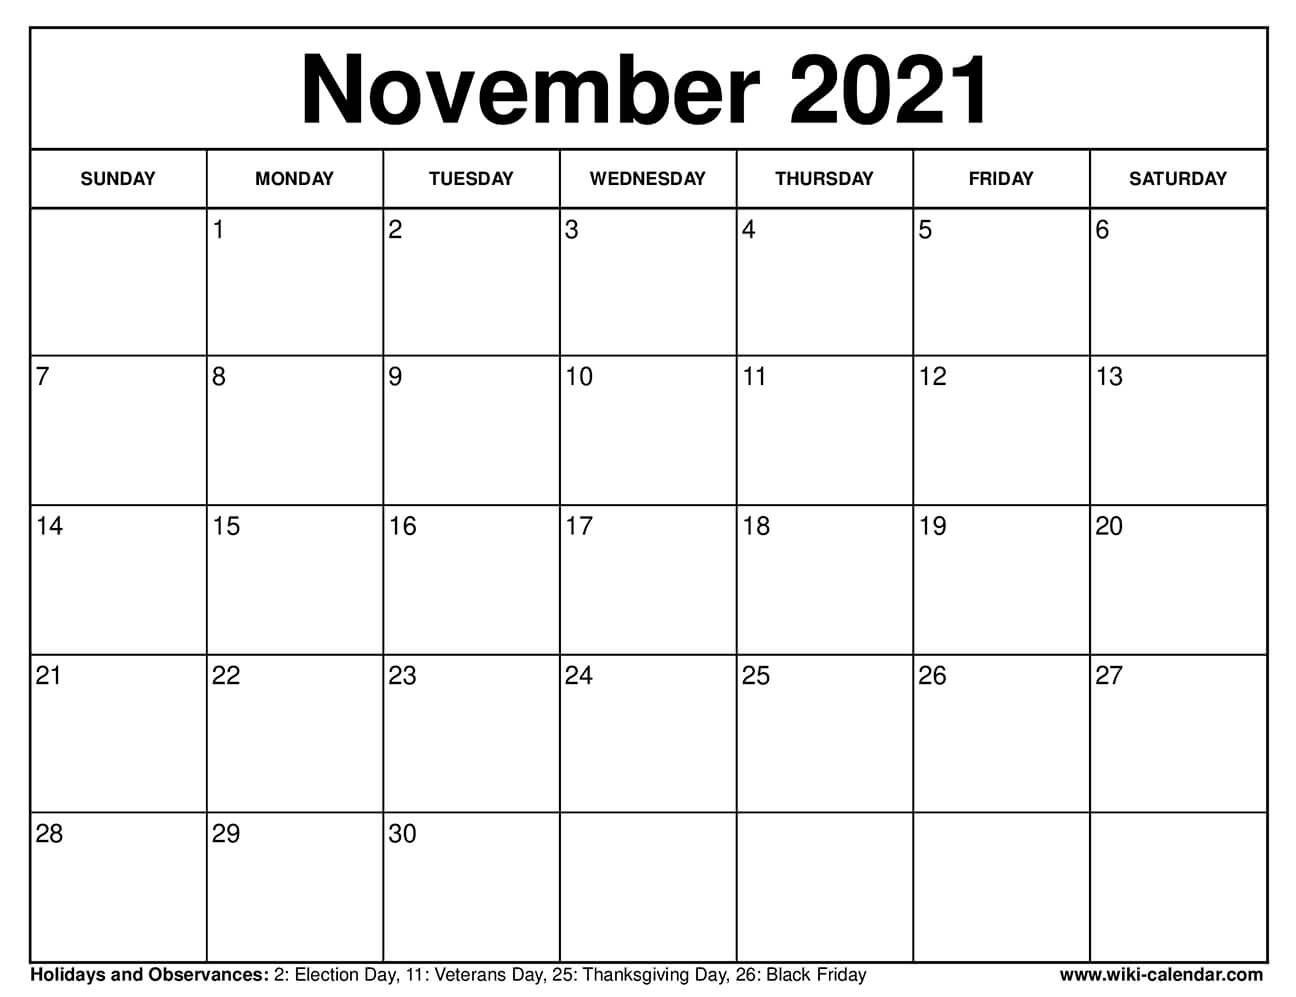 Free Printable November 2021 Calendars